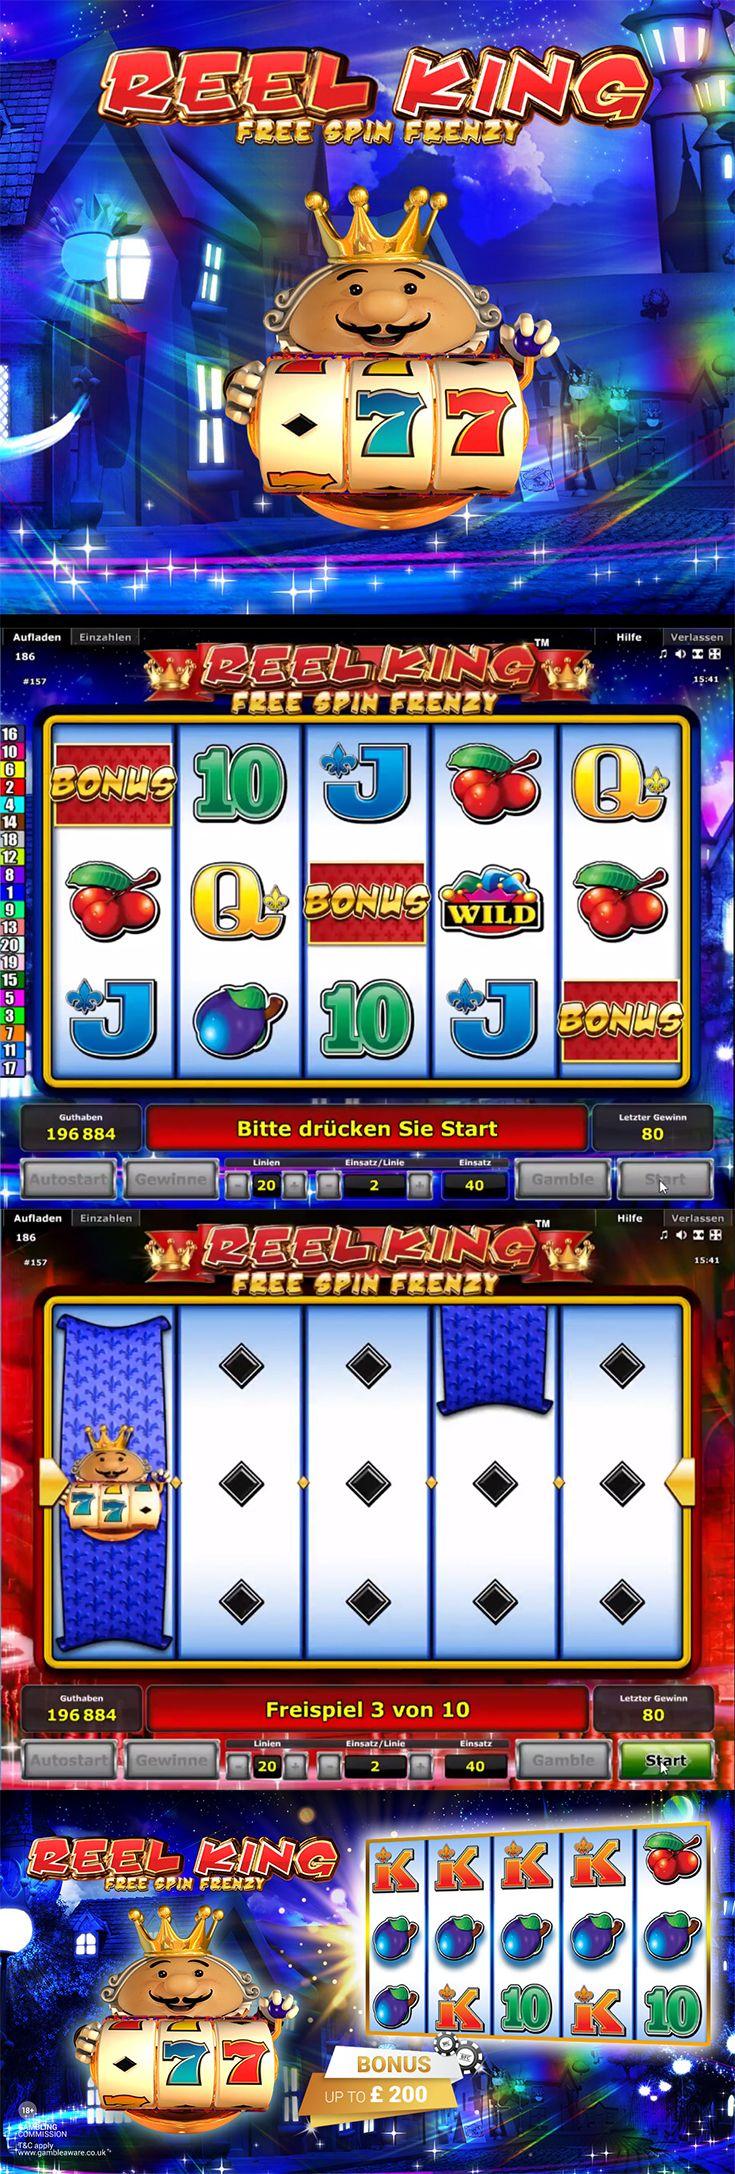 Casino official website emot